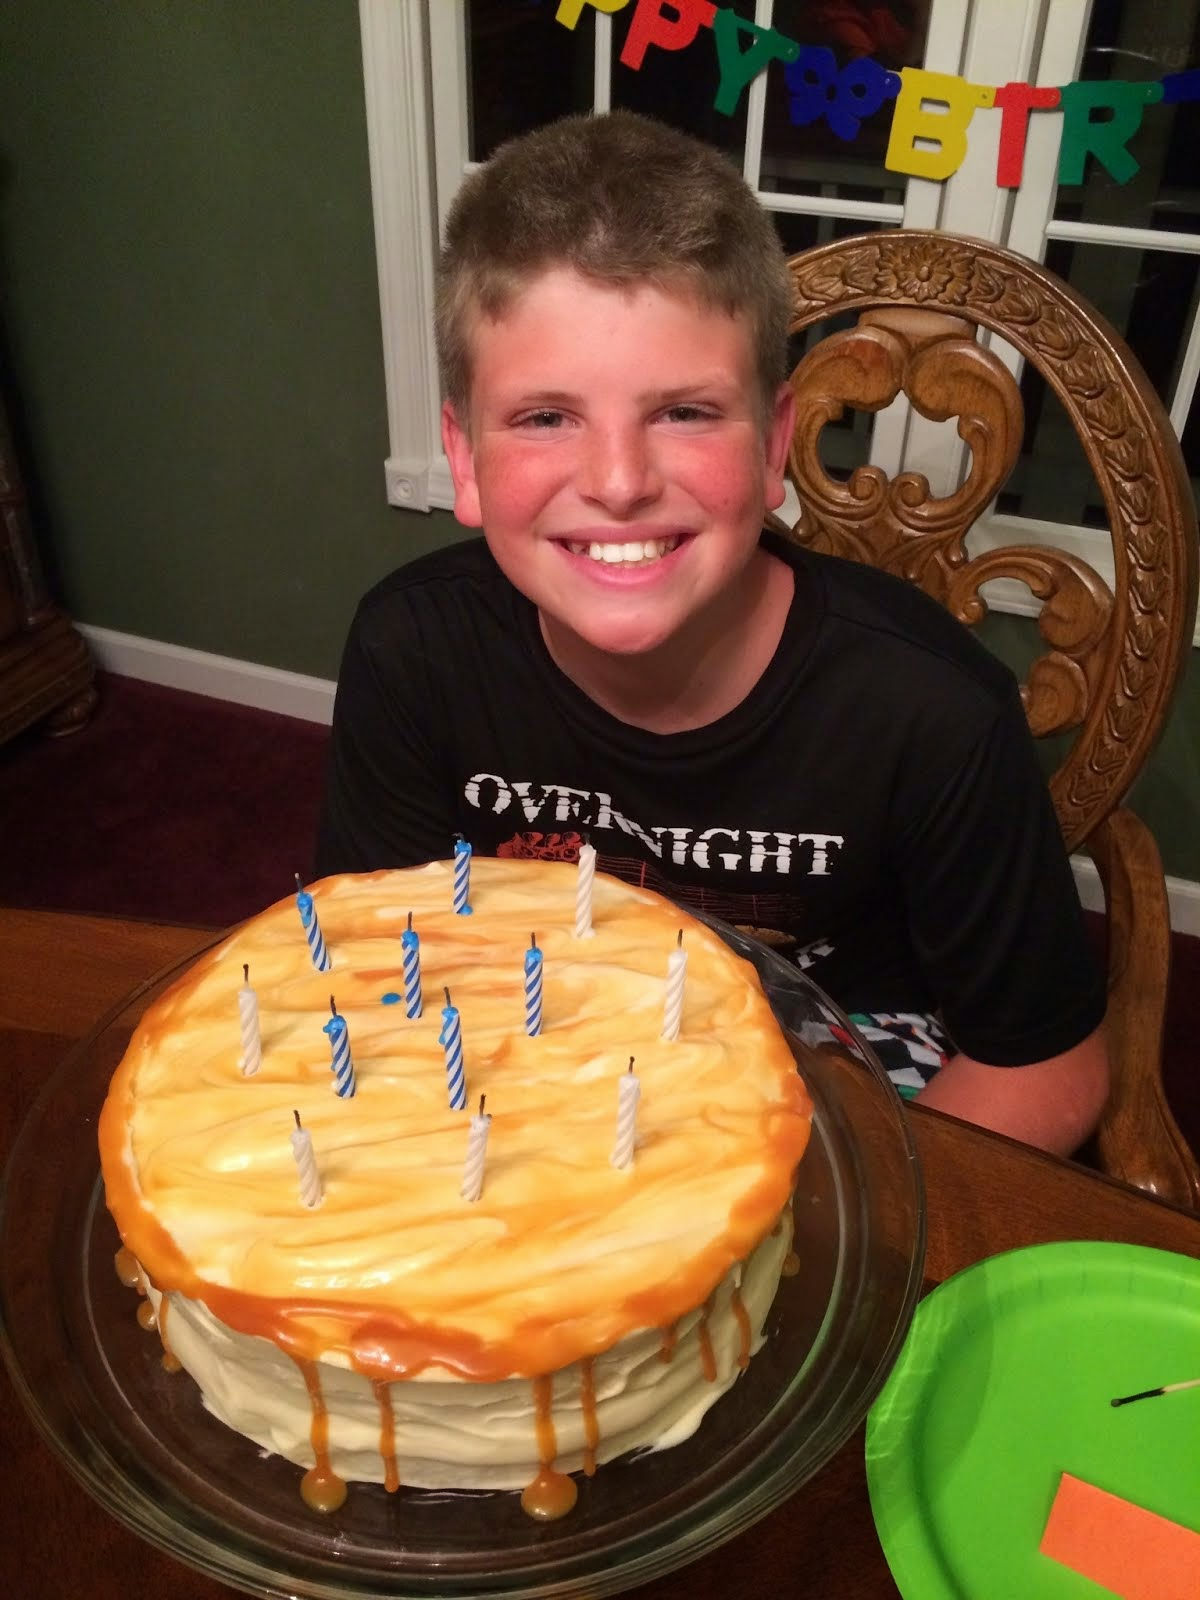 Elijah age 12